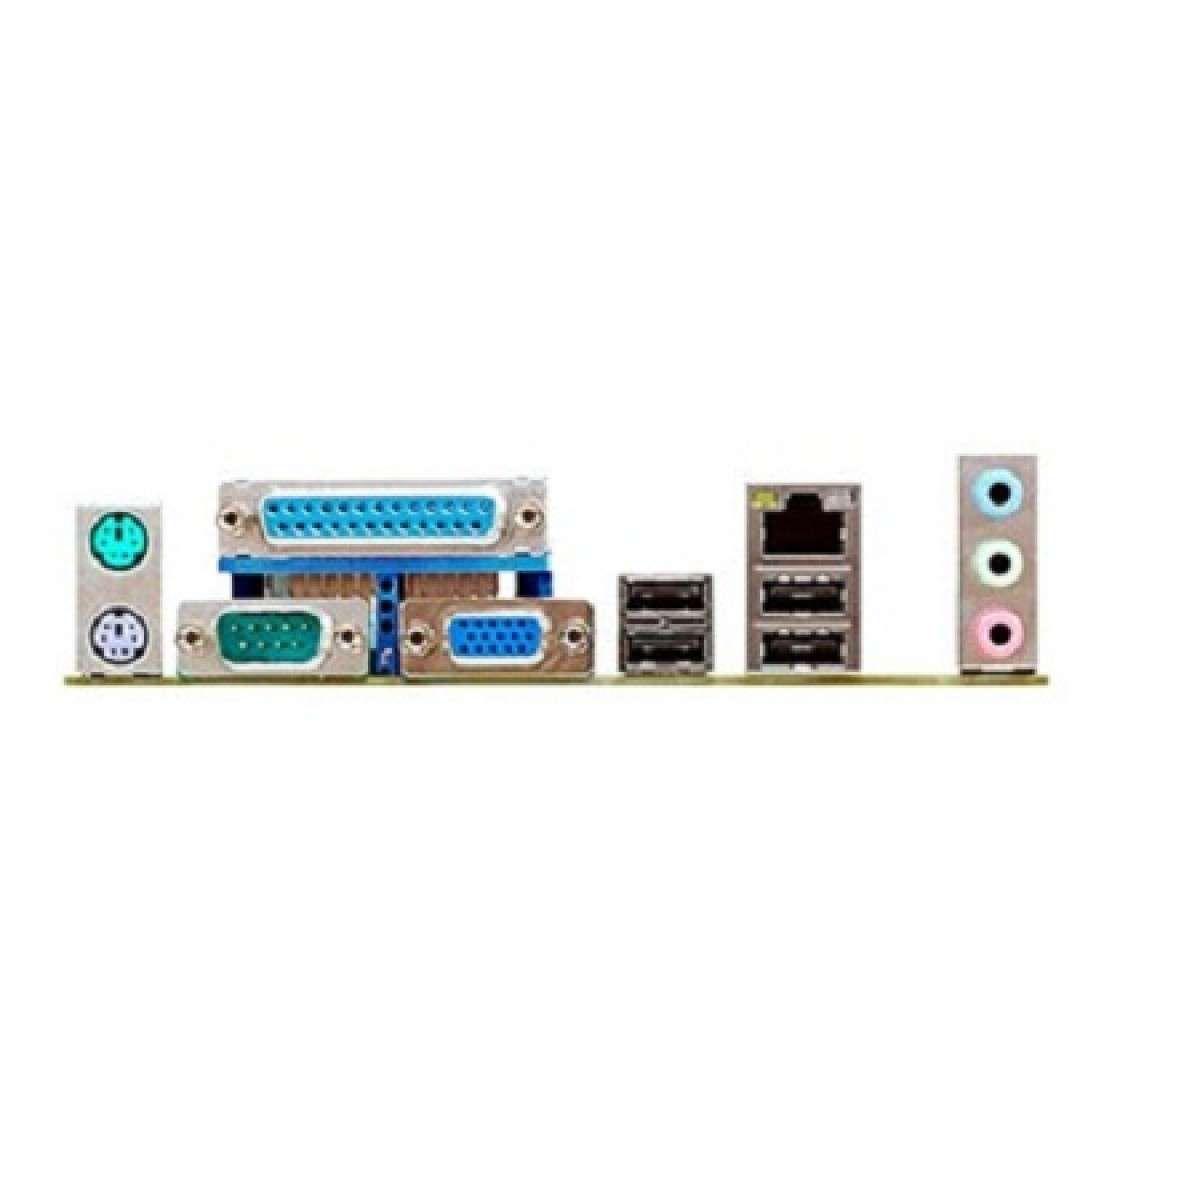 Placa Mãe Asus p/ AMD AM3+ uATX M5A78-M LX/BR, DDR3, VGA, Suporta FX/Phenom/Athlon 95W